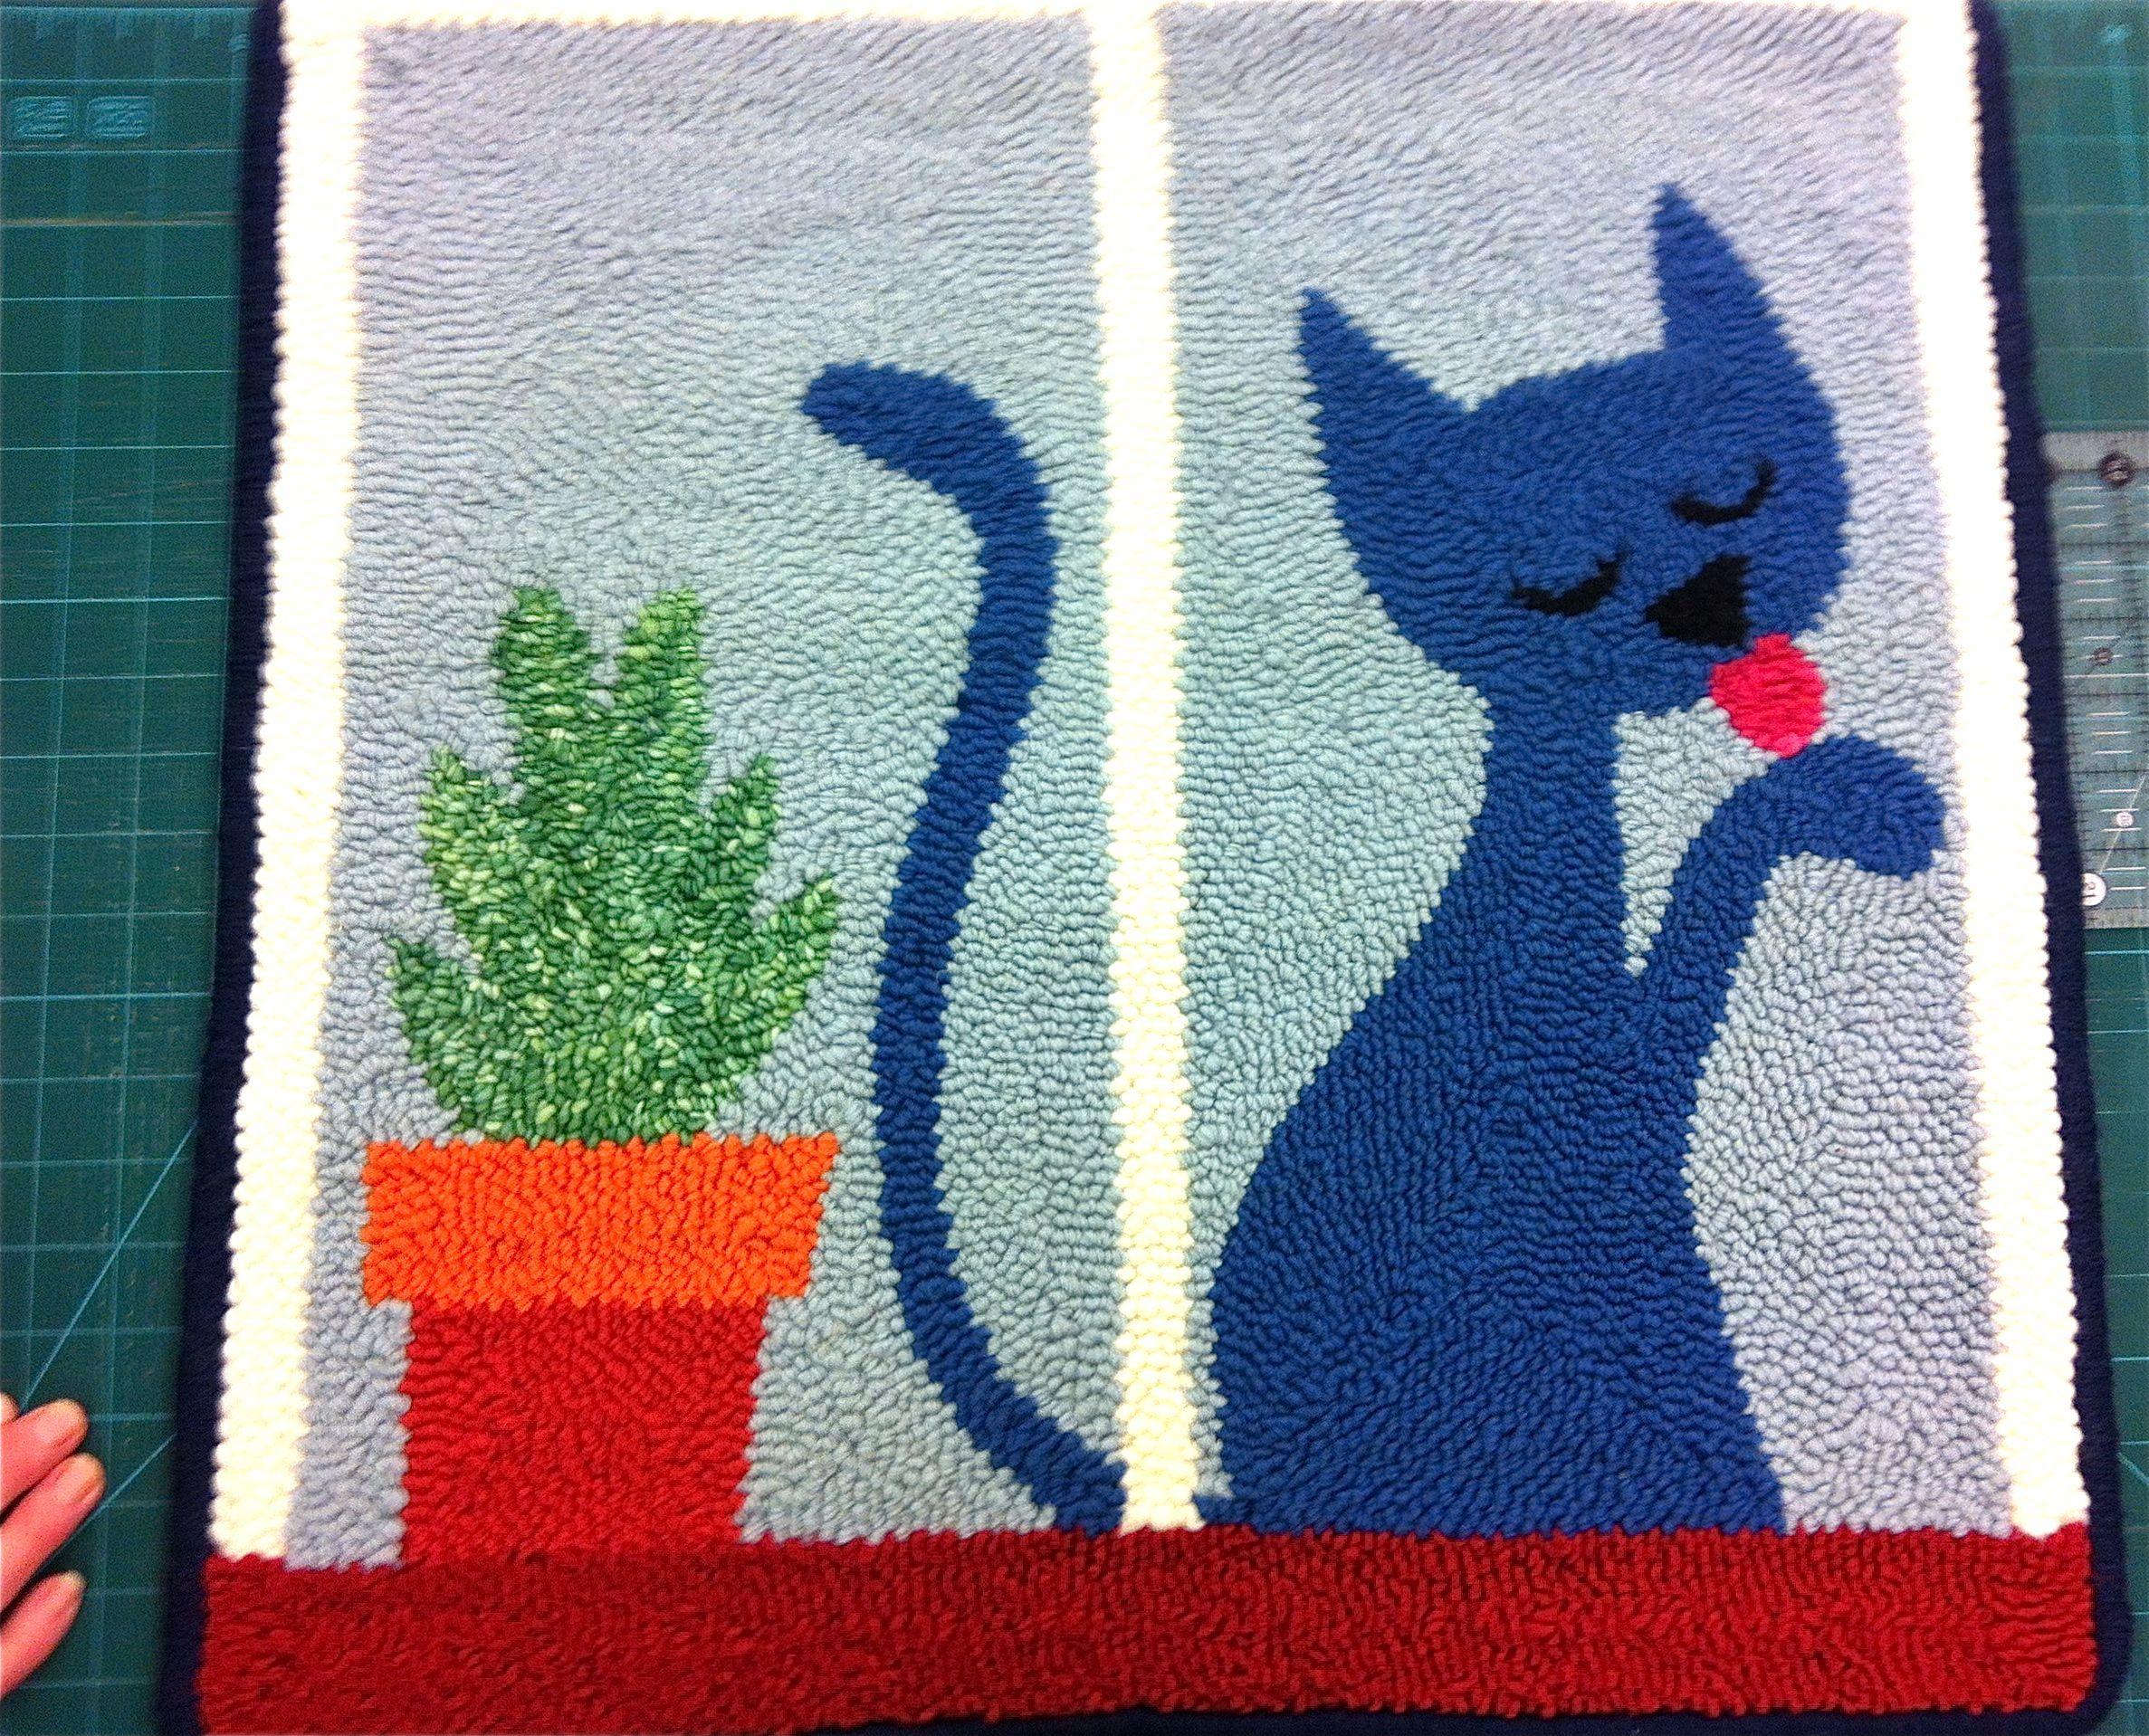 Sonia Fretter's Parisian Cat Rug. Sonia is from Liskeard